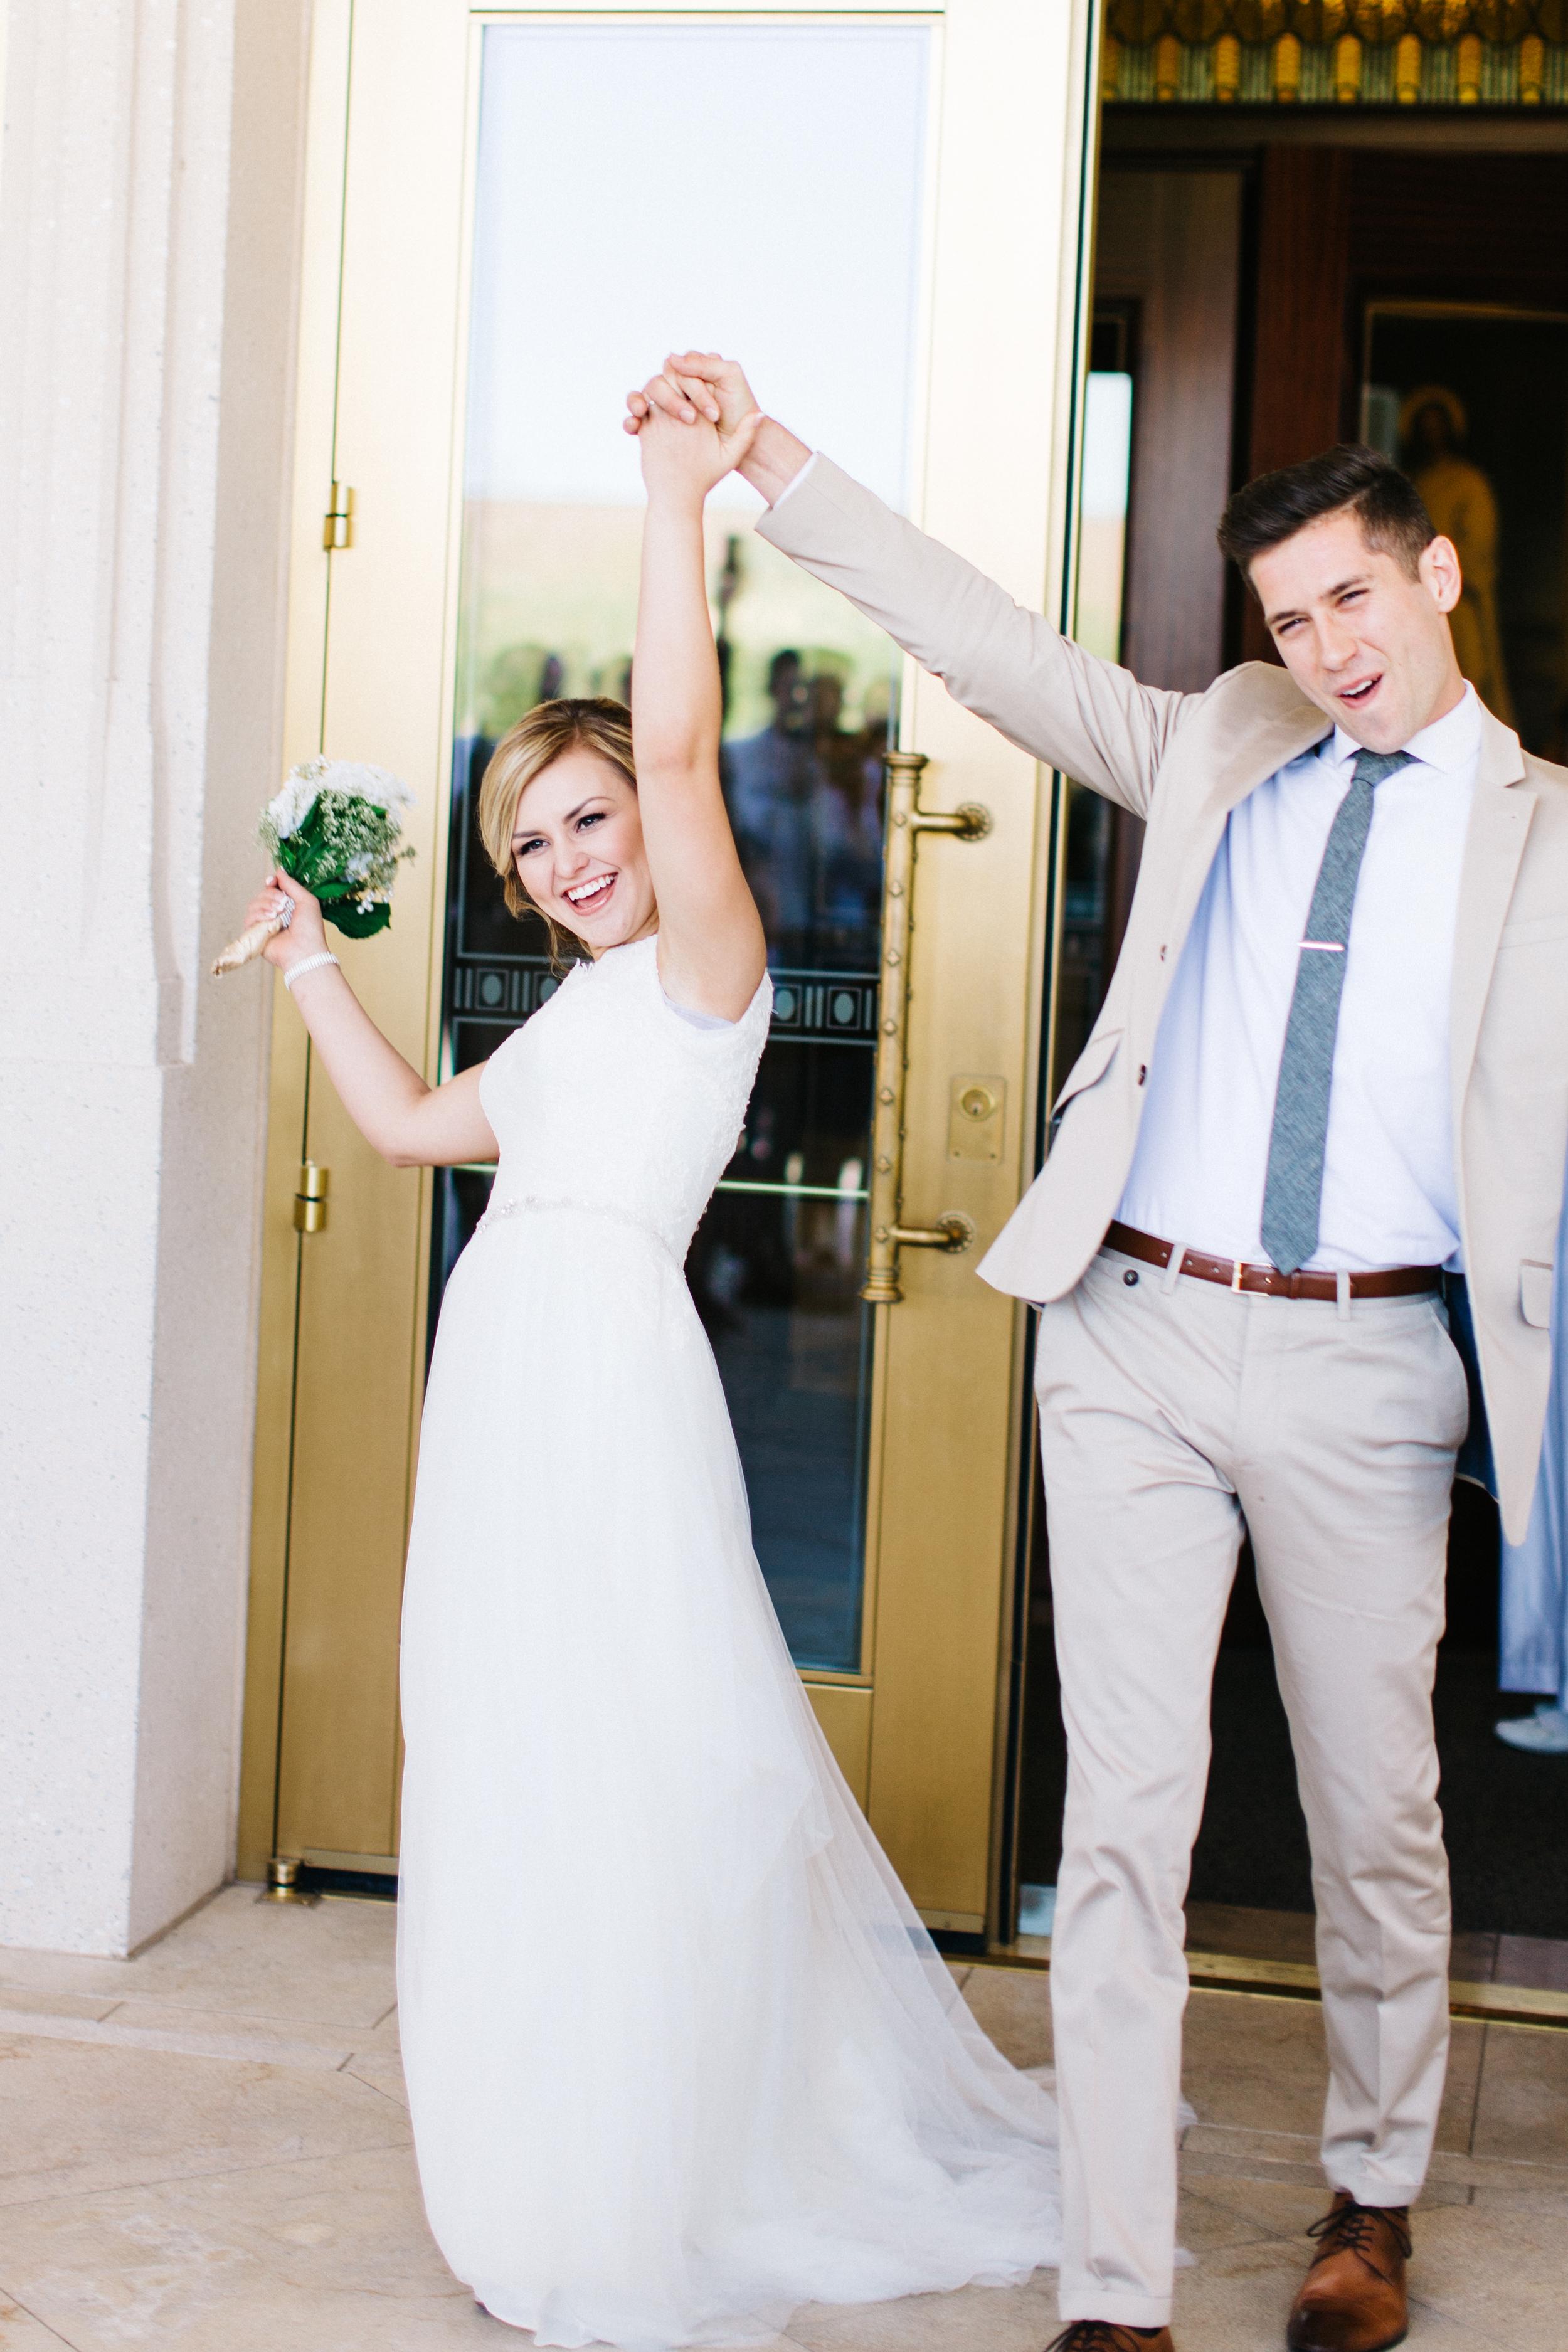 KennedyWyatt_WeddingDay-14.jpg